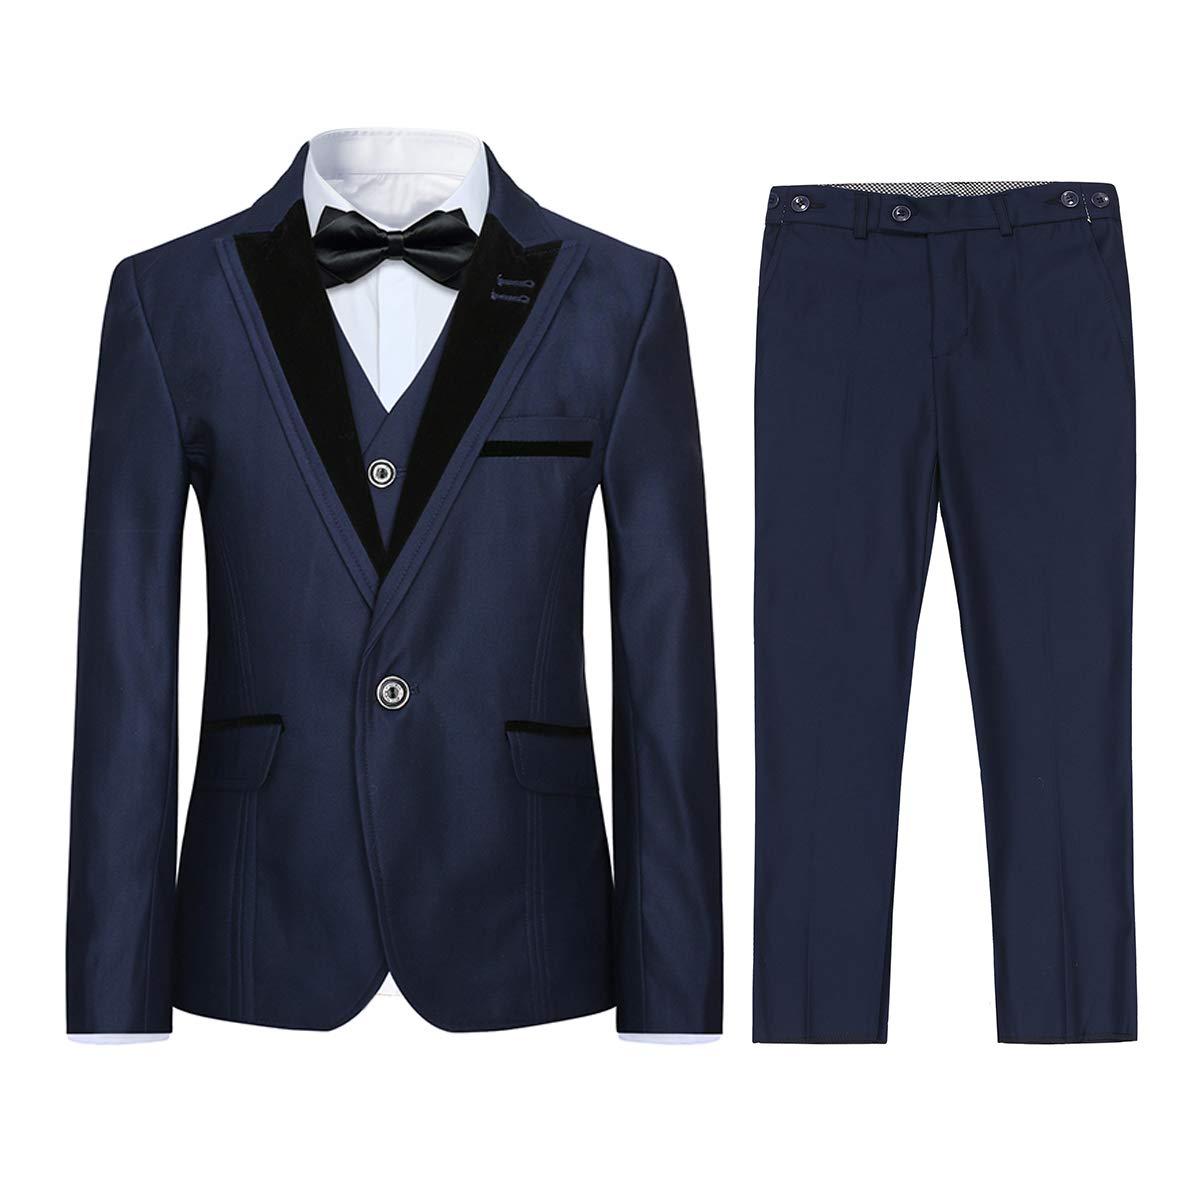 Boyland Boys 5 Pieces Formal Suits Classic Peak Lapel Slim Fit Tux Jacket Vest Pants Birthday Party Wedding Navy